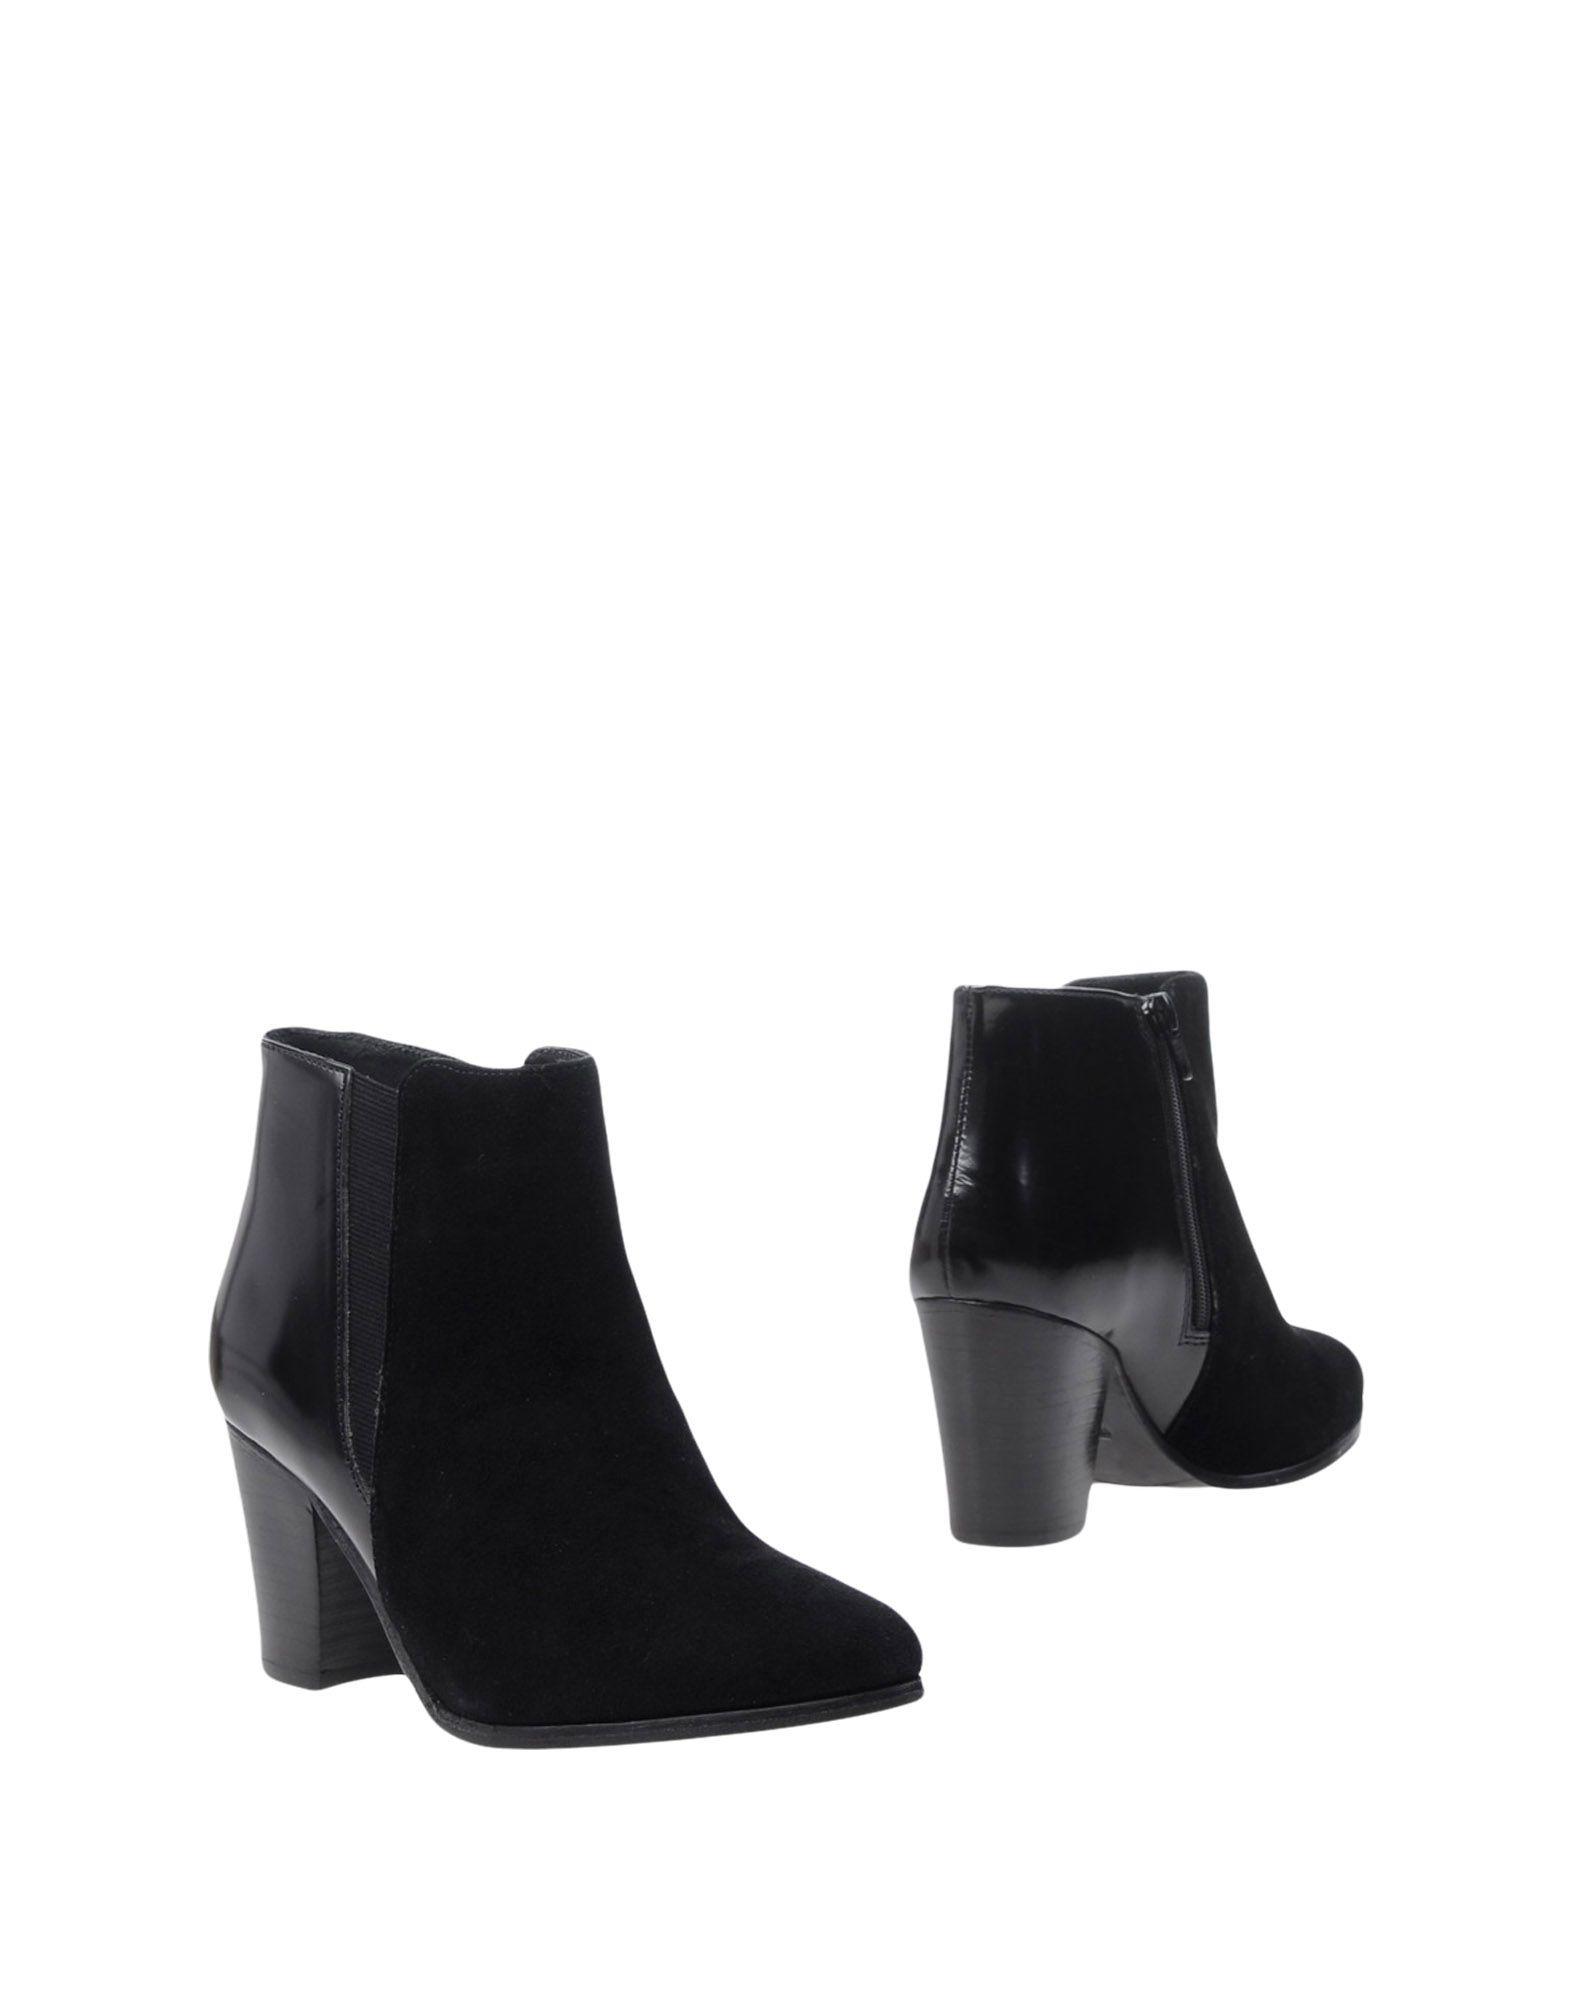 Daniela Mori Milano Stiefelette Damen  11363610EH Gute Qualität beliebte Schuhe